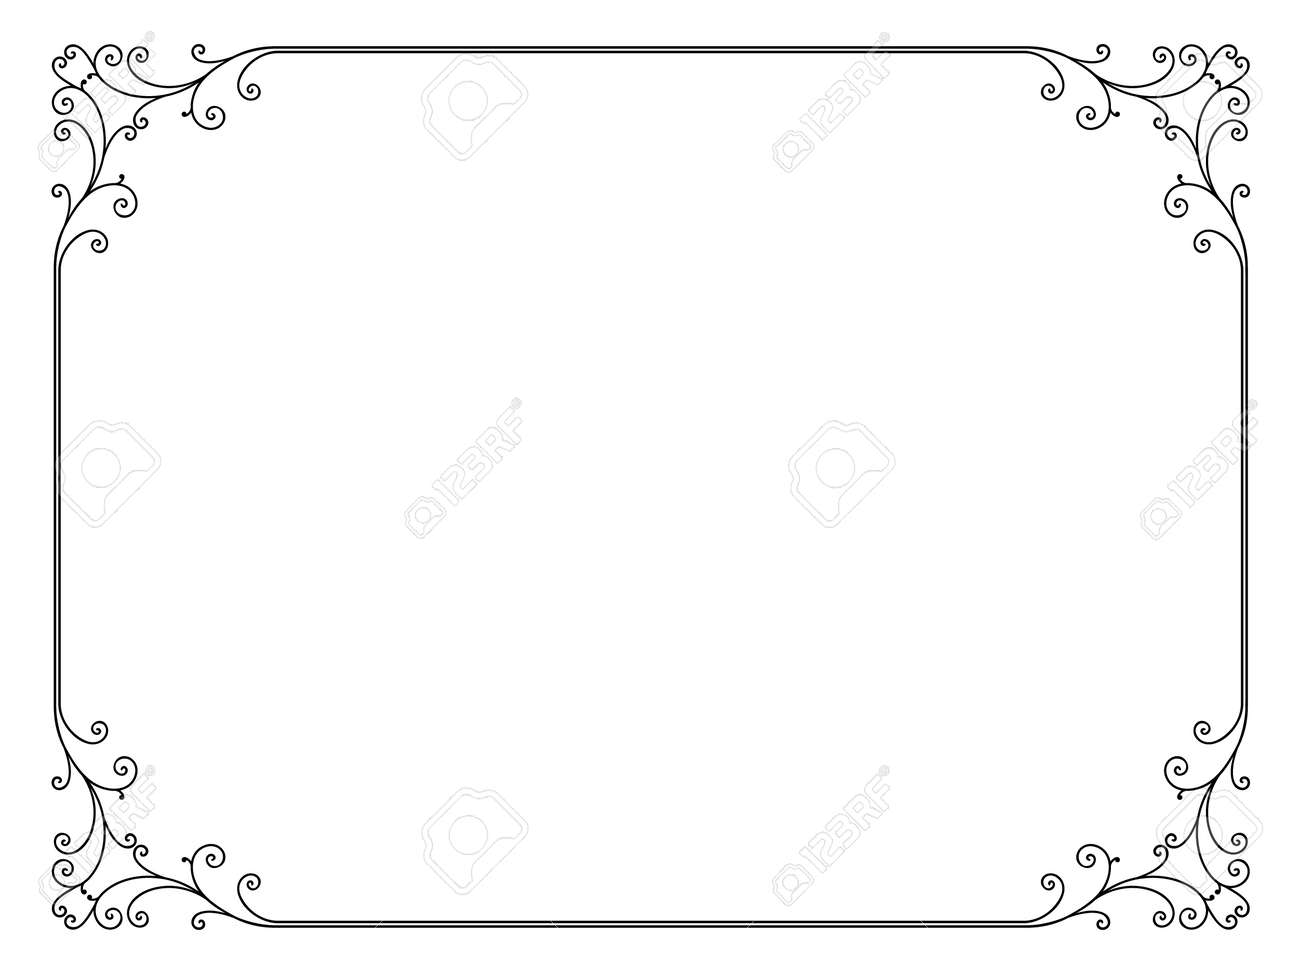 simple calligraph ornamental decorative frame pattern - 12494753